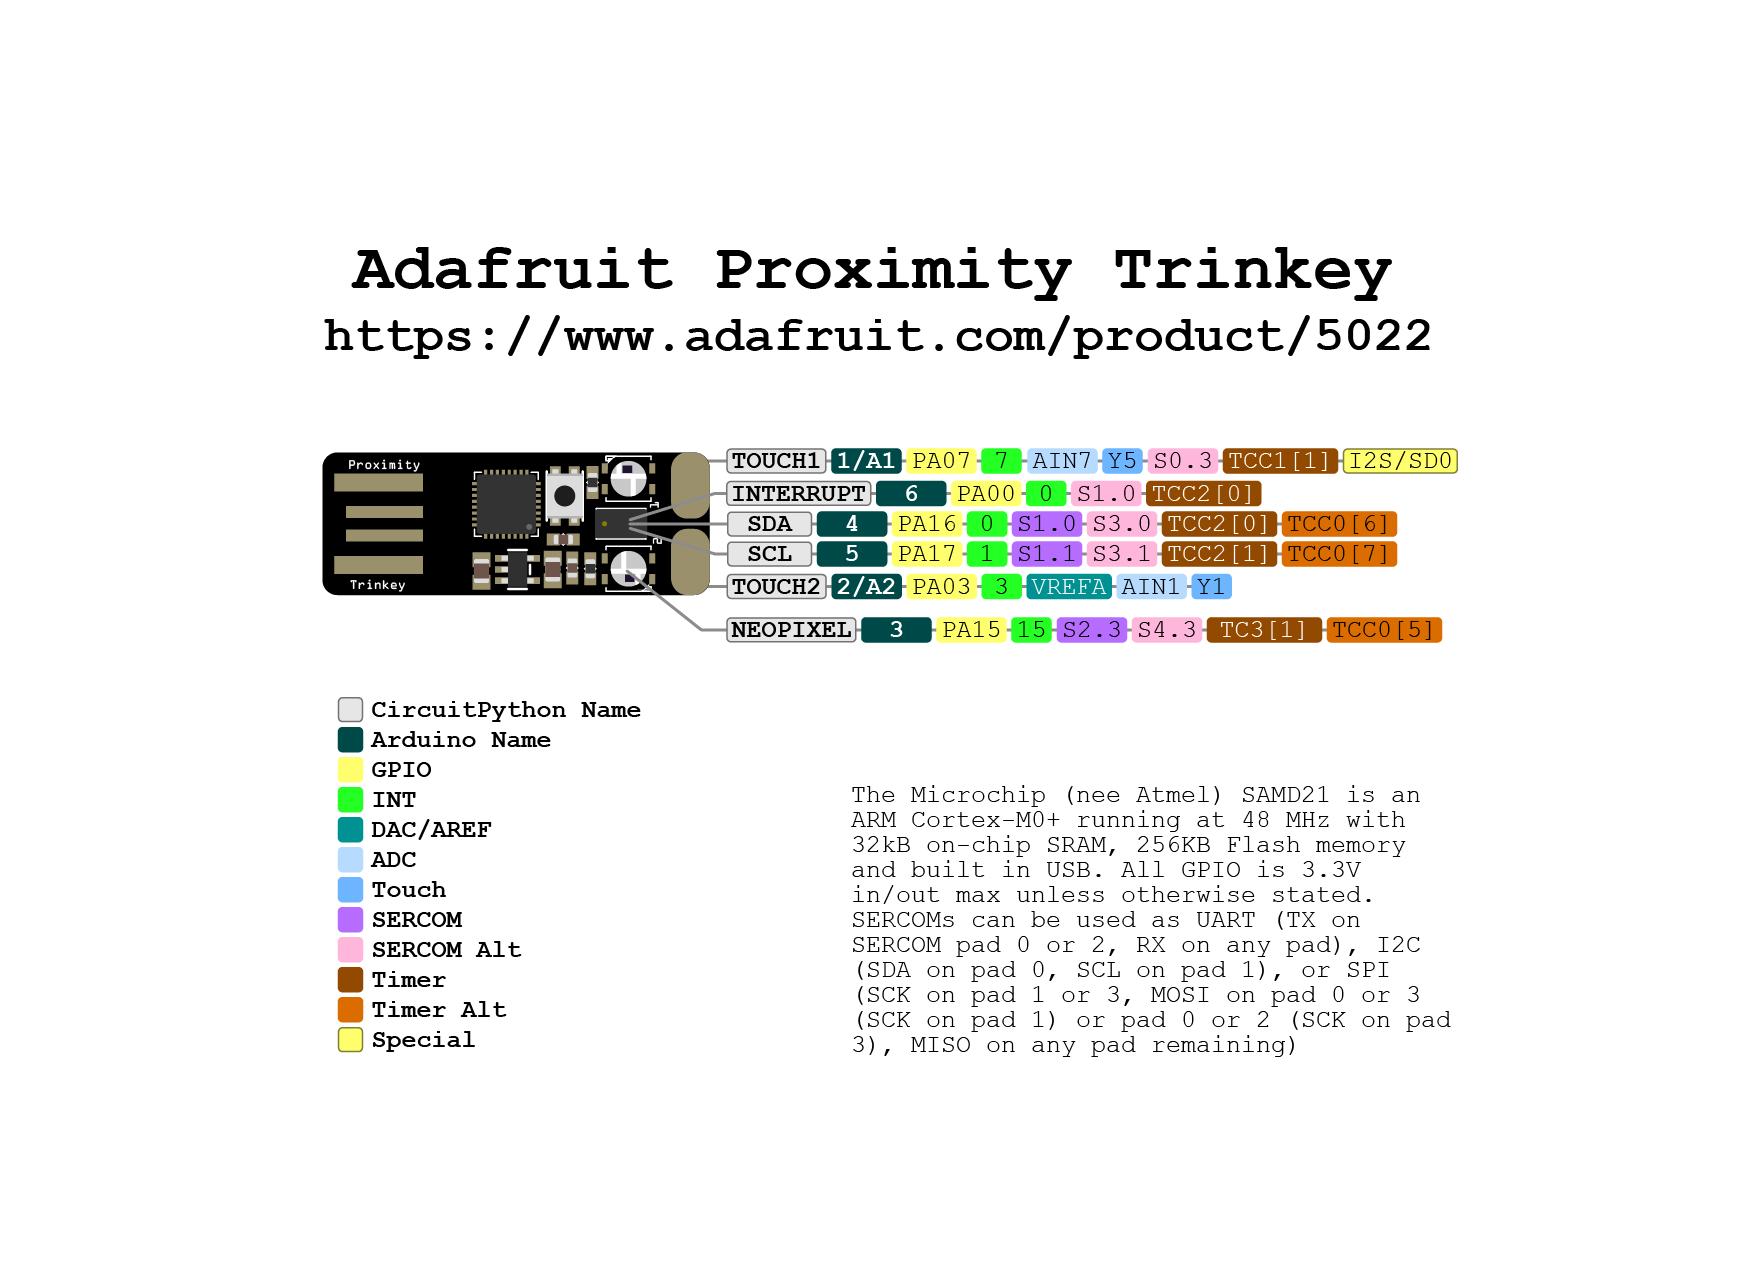 adafruit_products_Adafruit_Proximity_Trinkey_Pinout.png